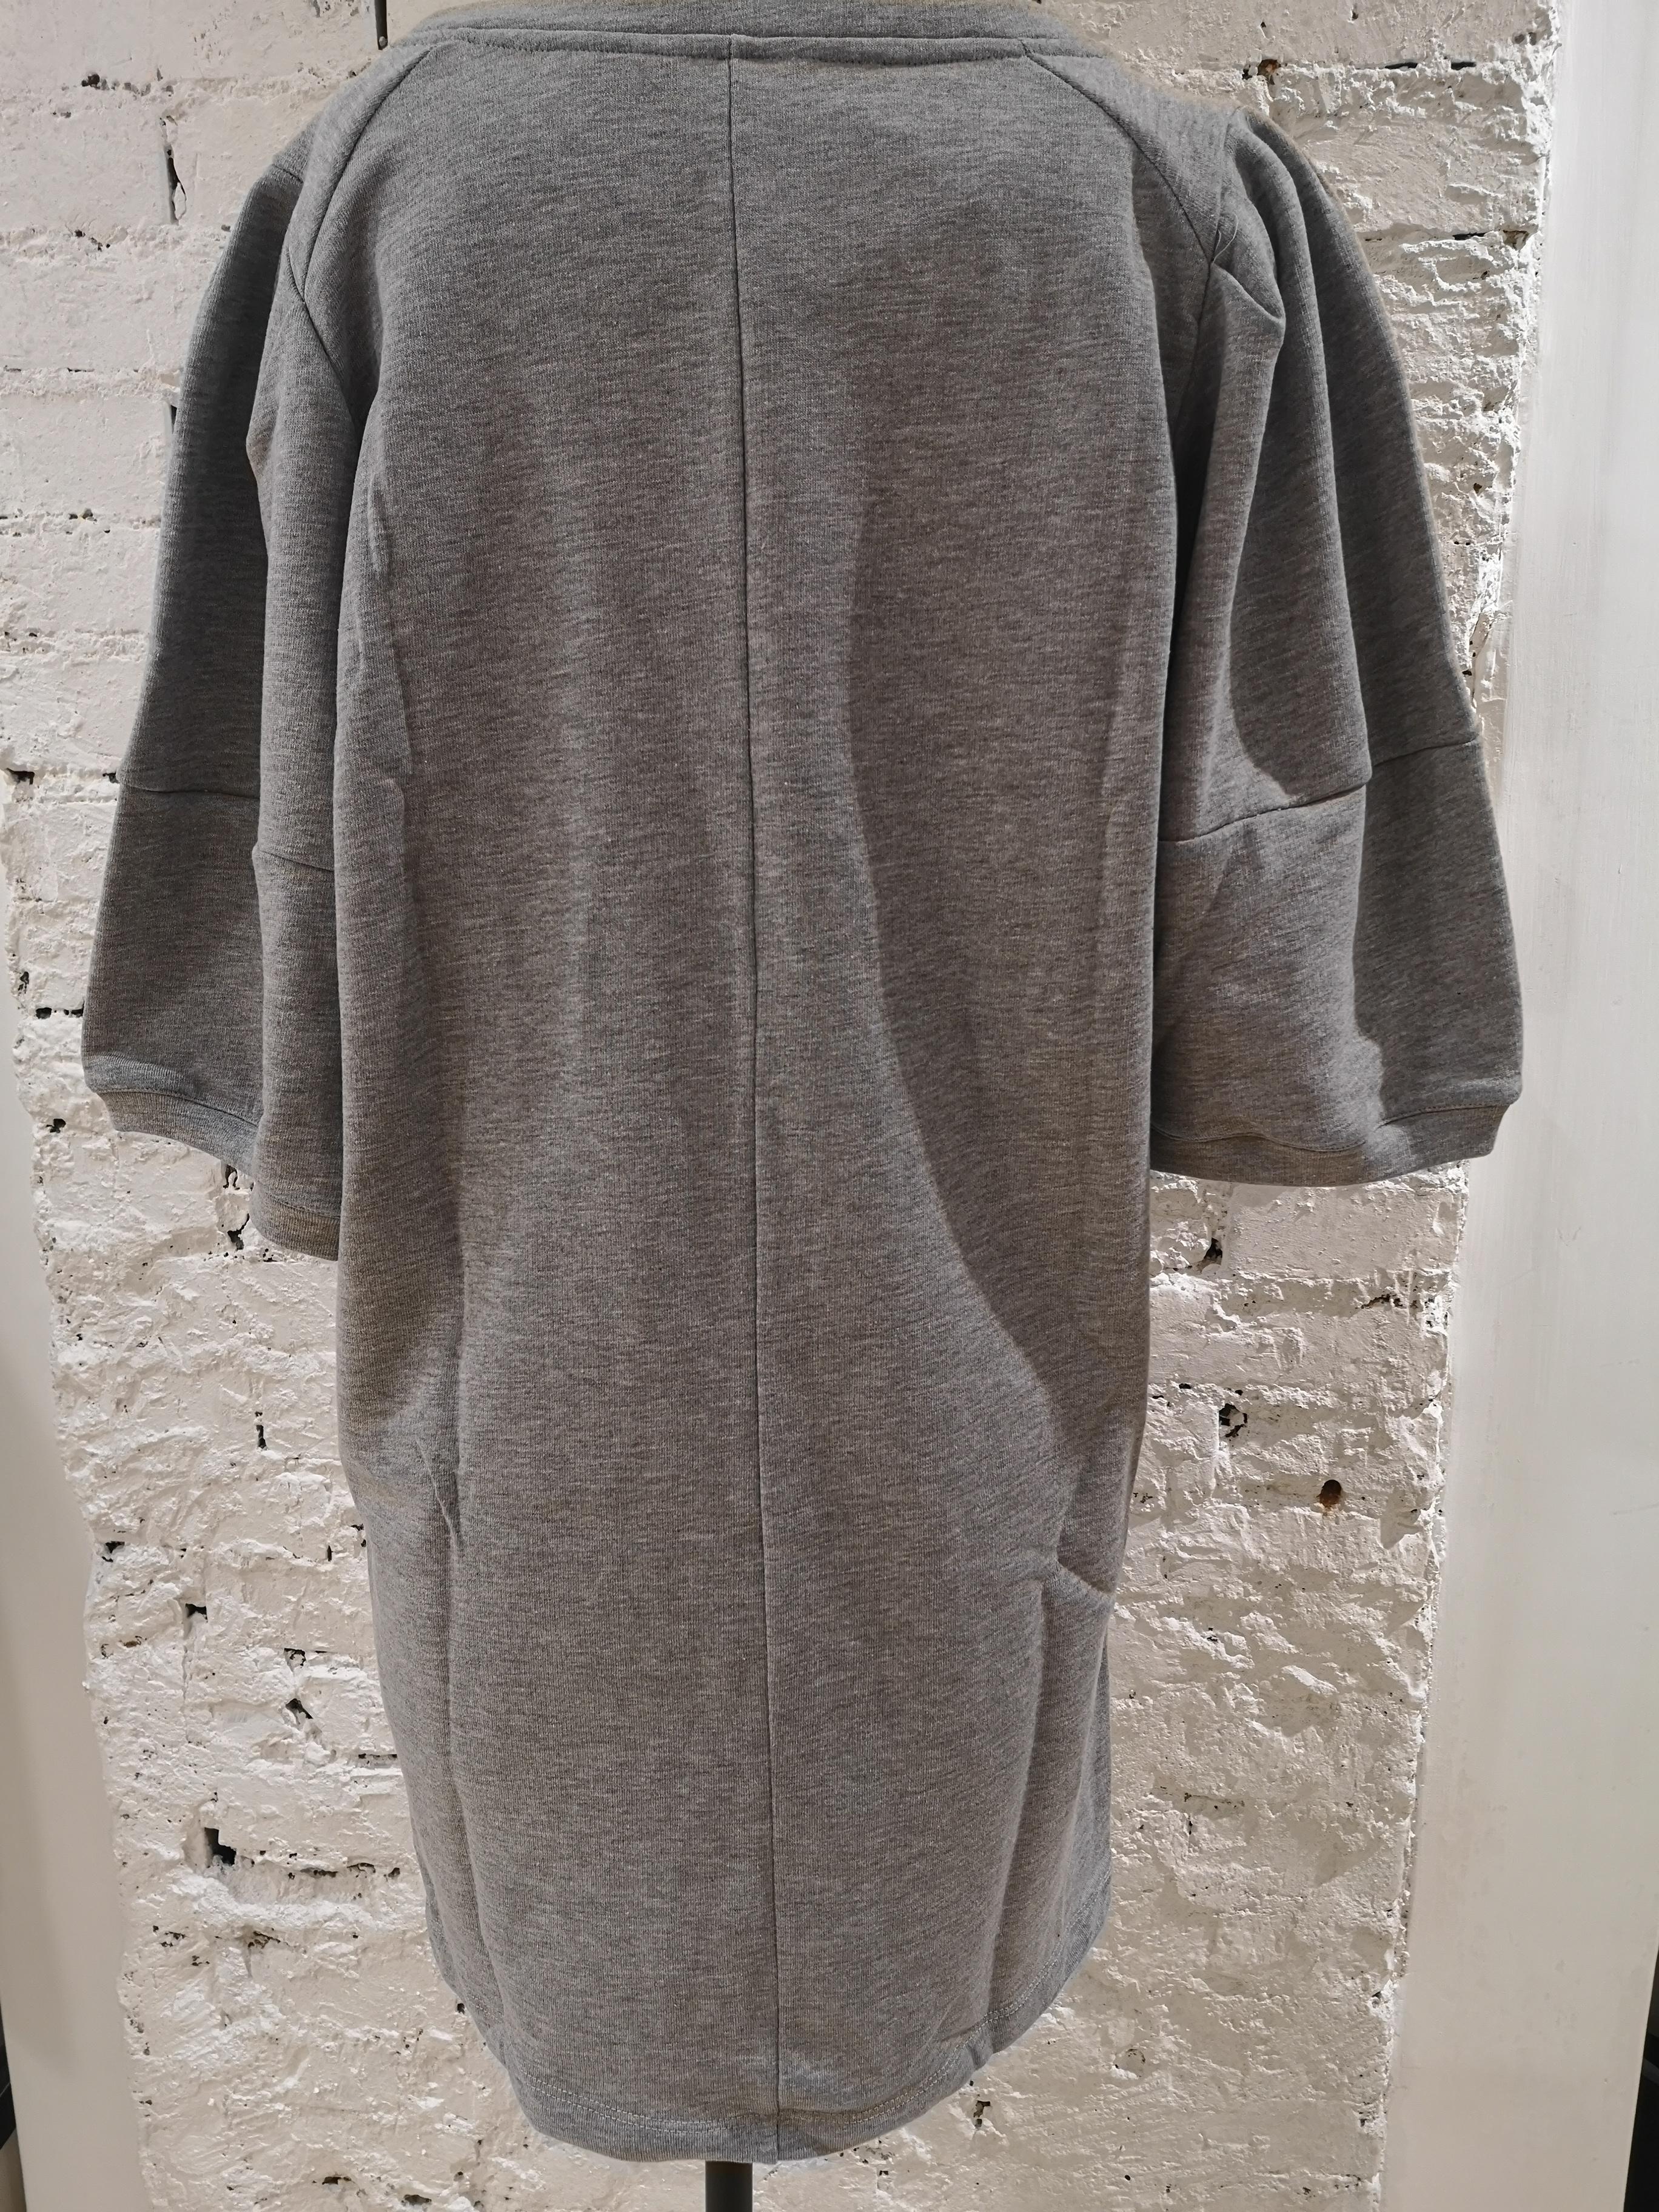 Gli Psicopatici I am Fake Minnie cotton long dress / sweater Gli Psicopatici | Sweaters | FELPAFAKE